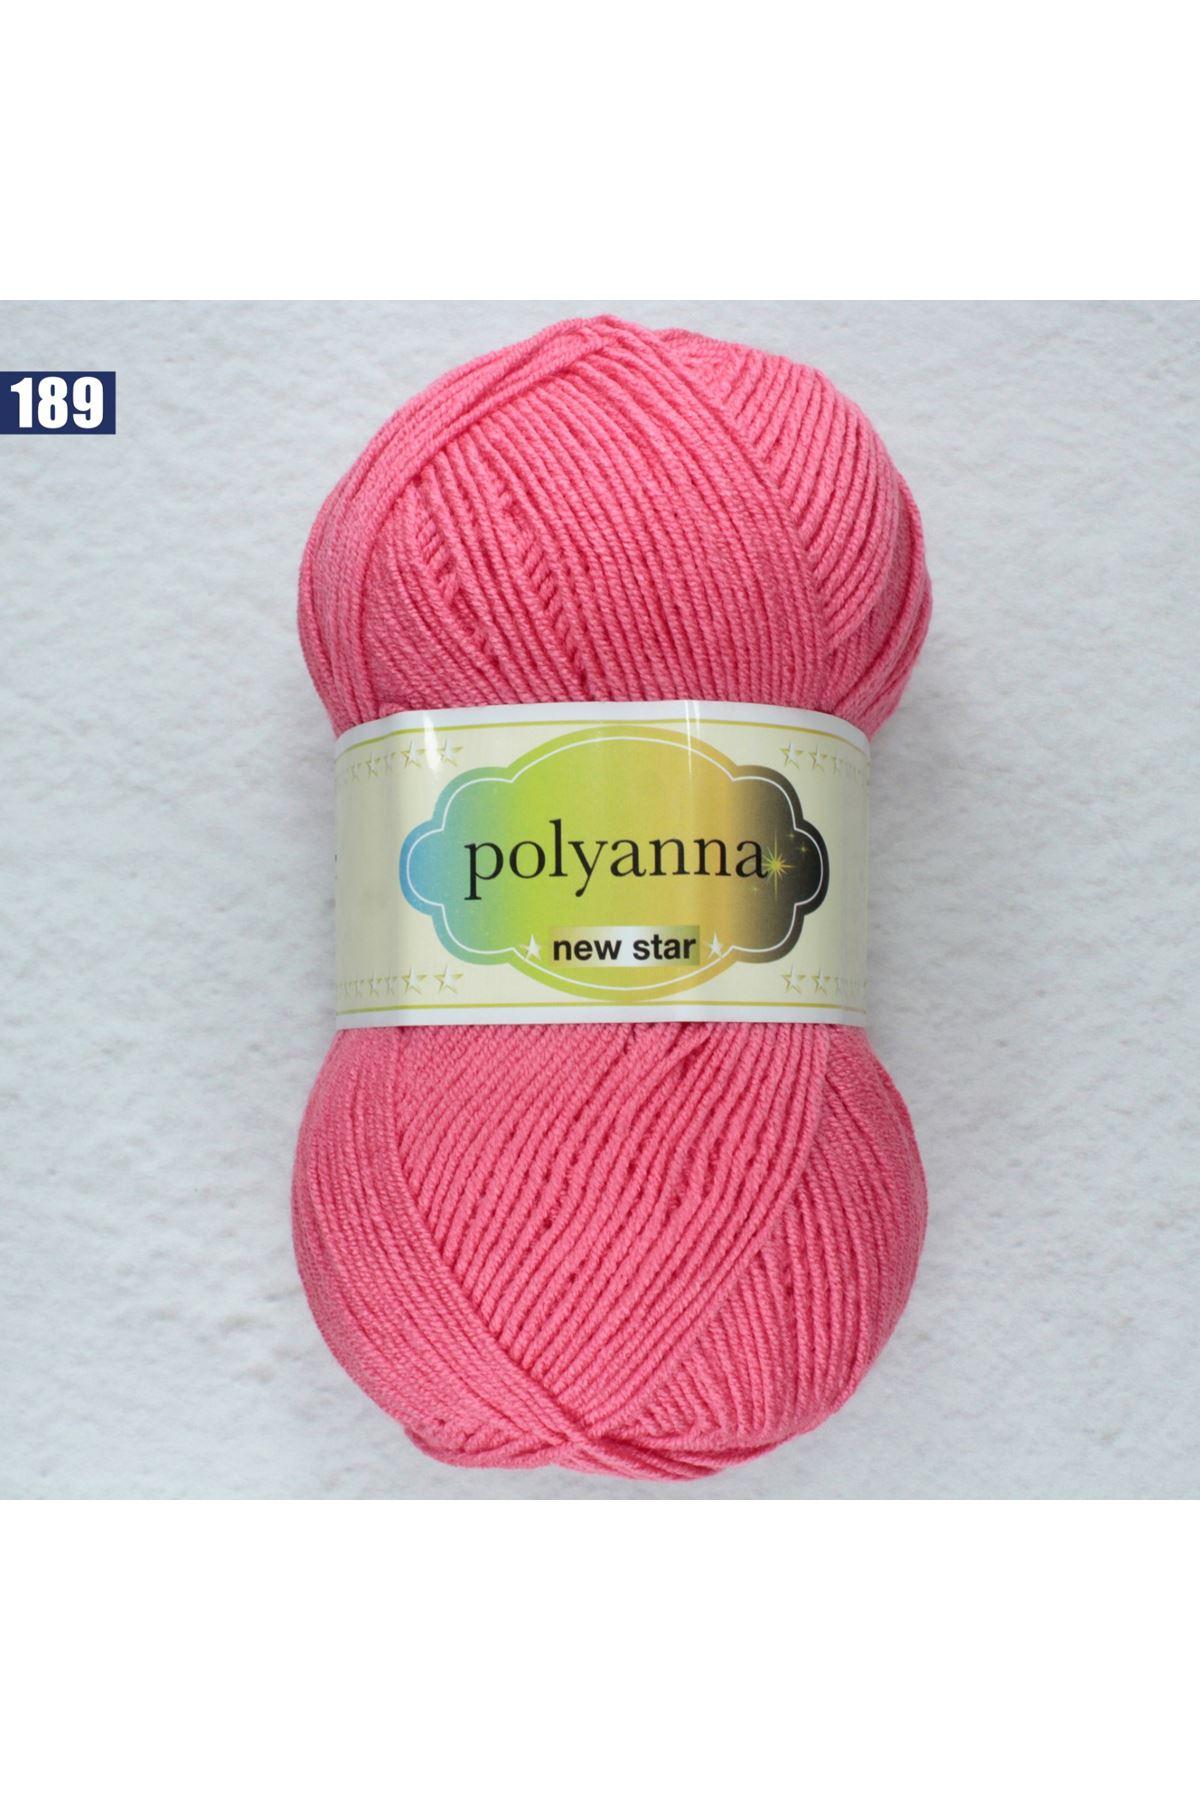 Polyanna New Star 189